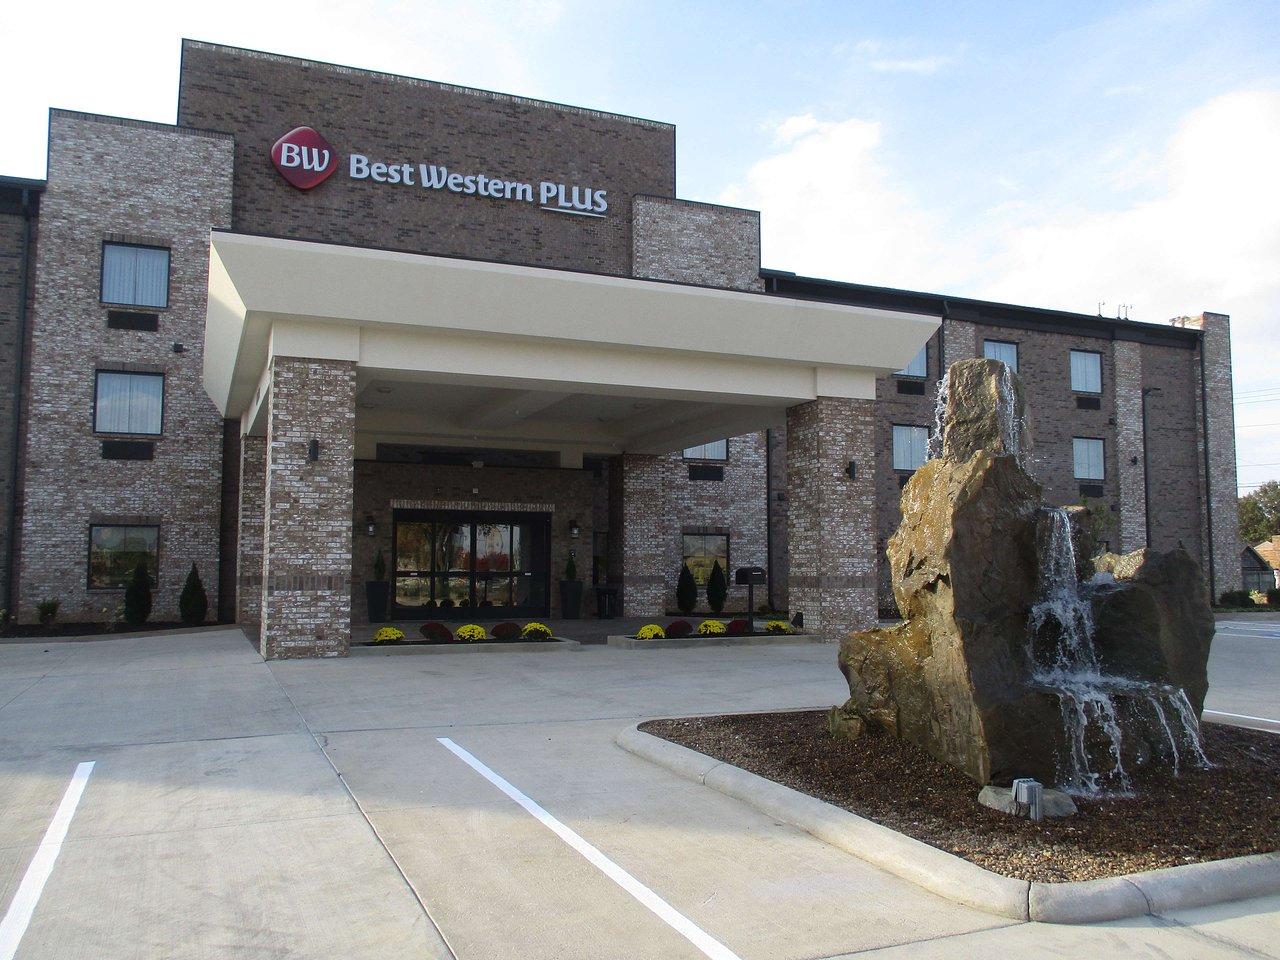 Best Western Plus Owensboro 89 1 0 1 Updated 2020 Prices